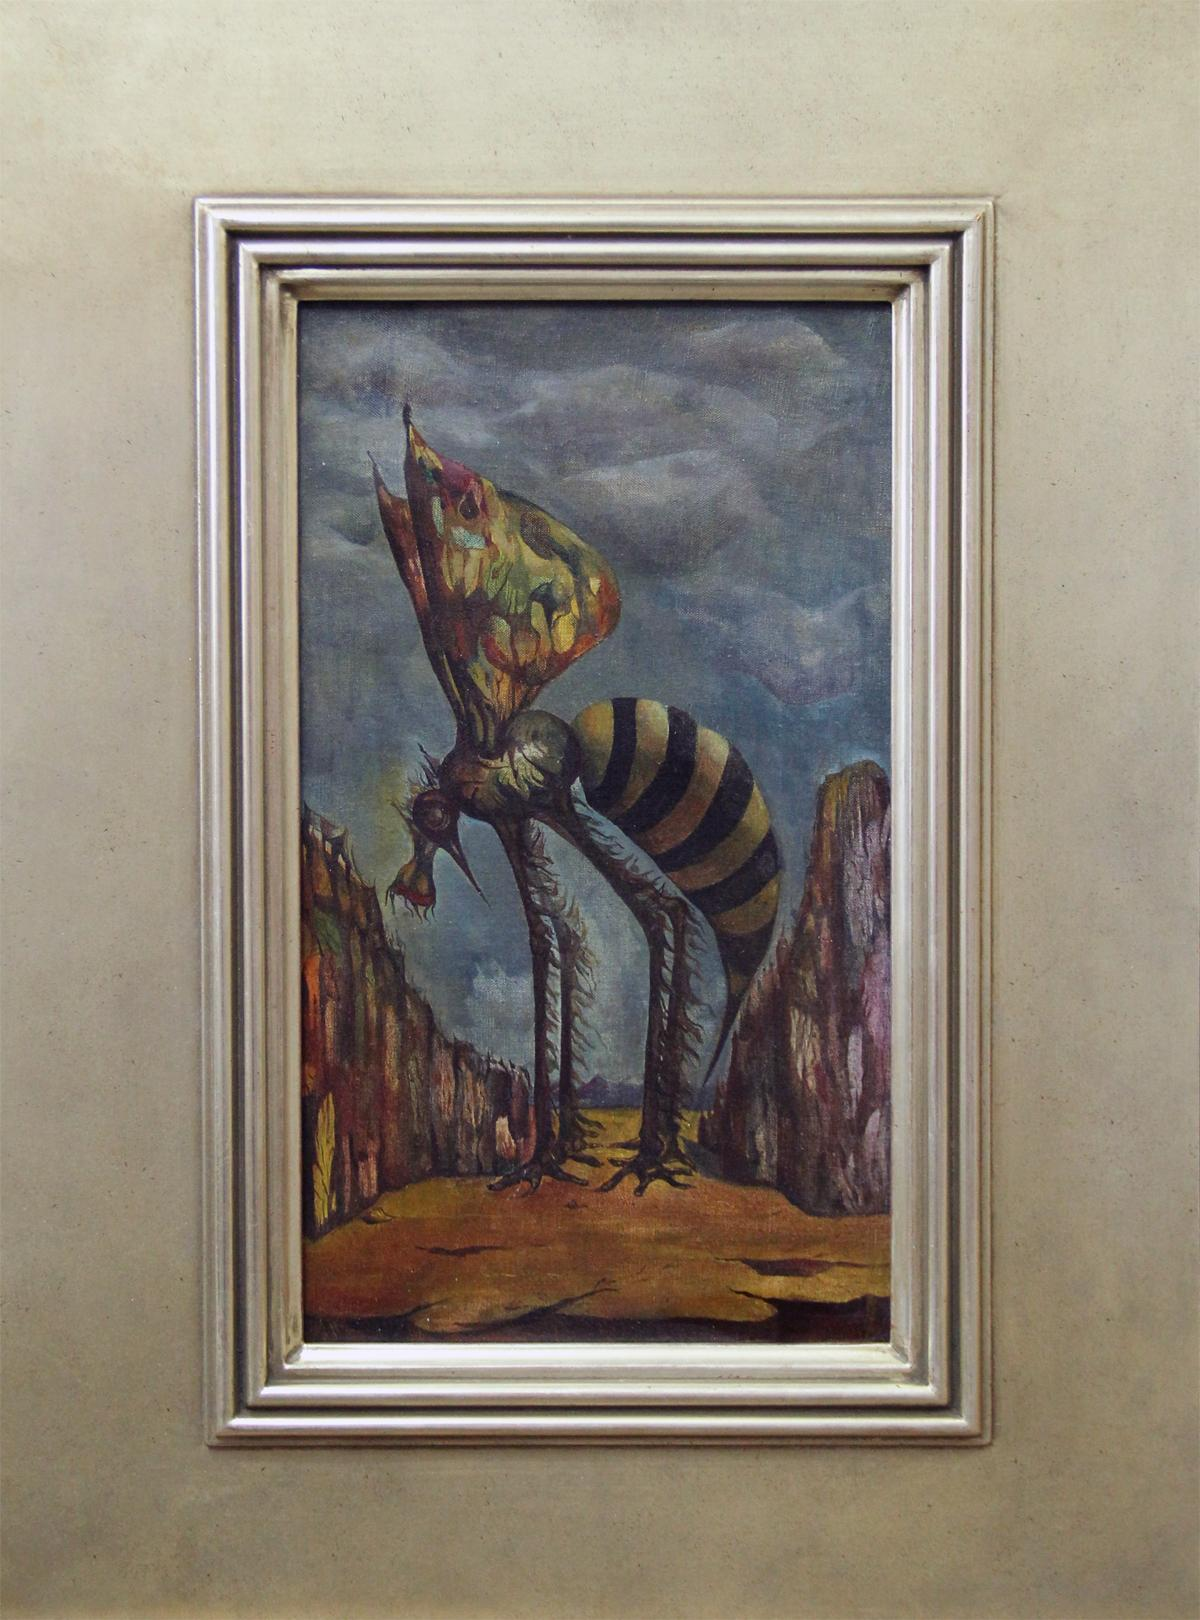 Mosquito on Orange Mountain, Surrealist Landscape, Oil on Canvas, 1943, Framed